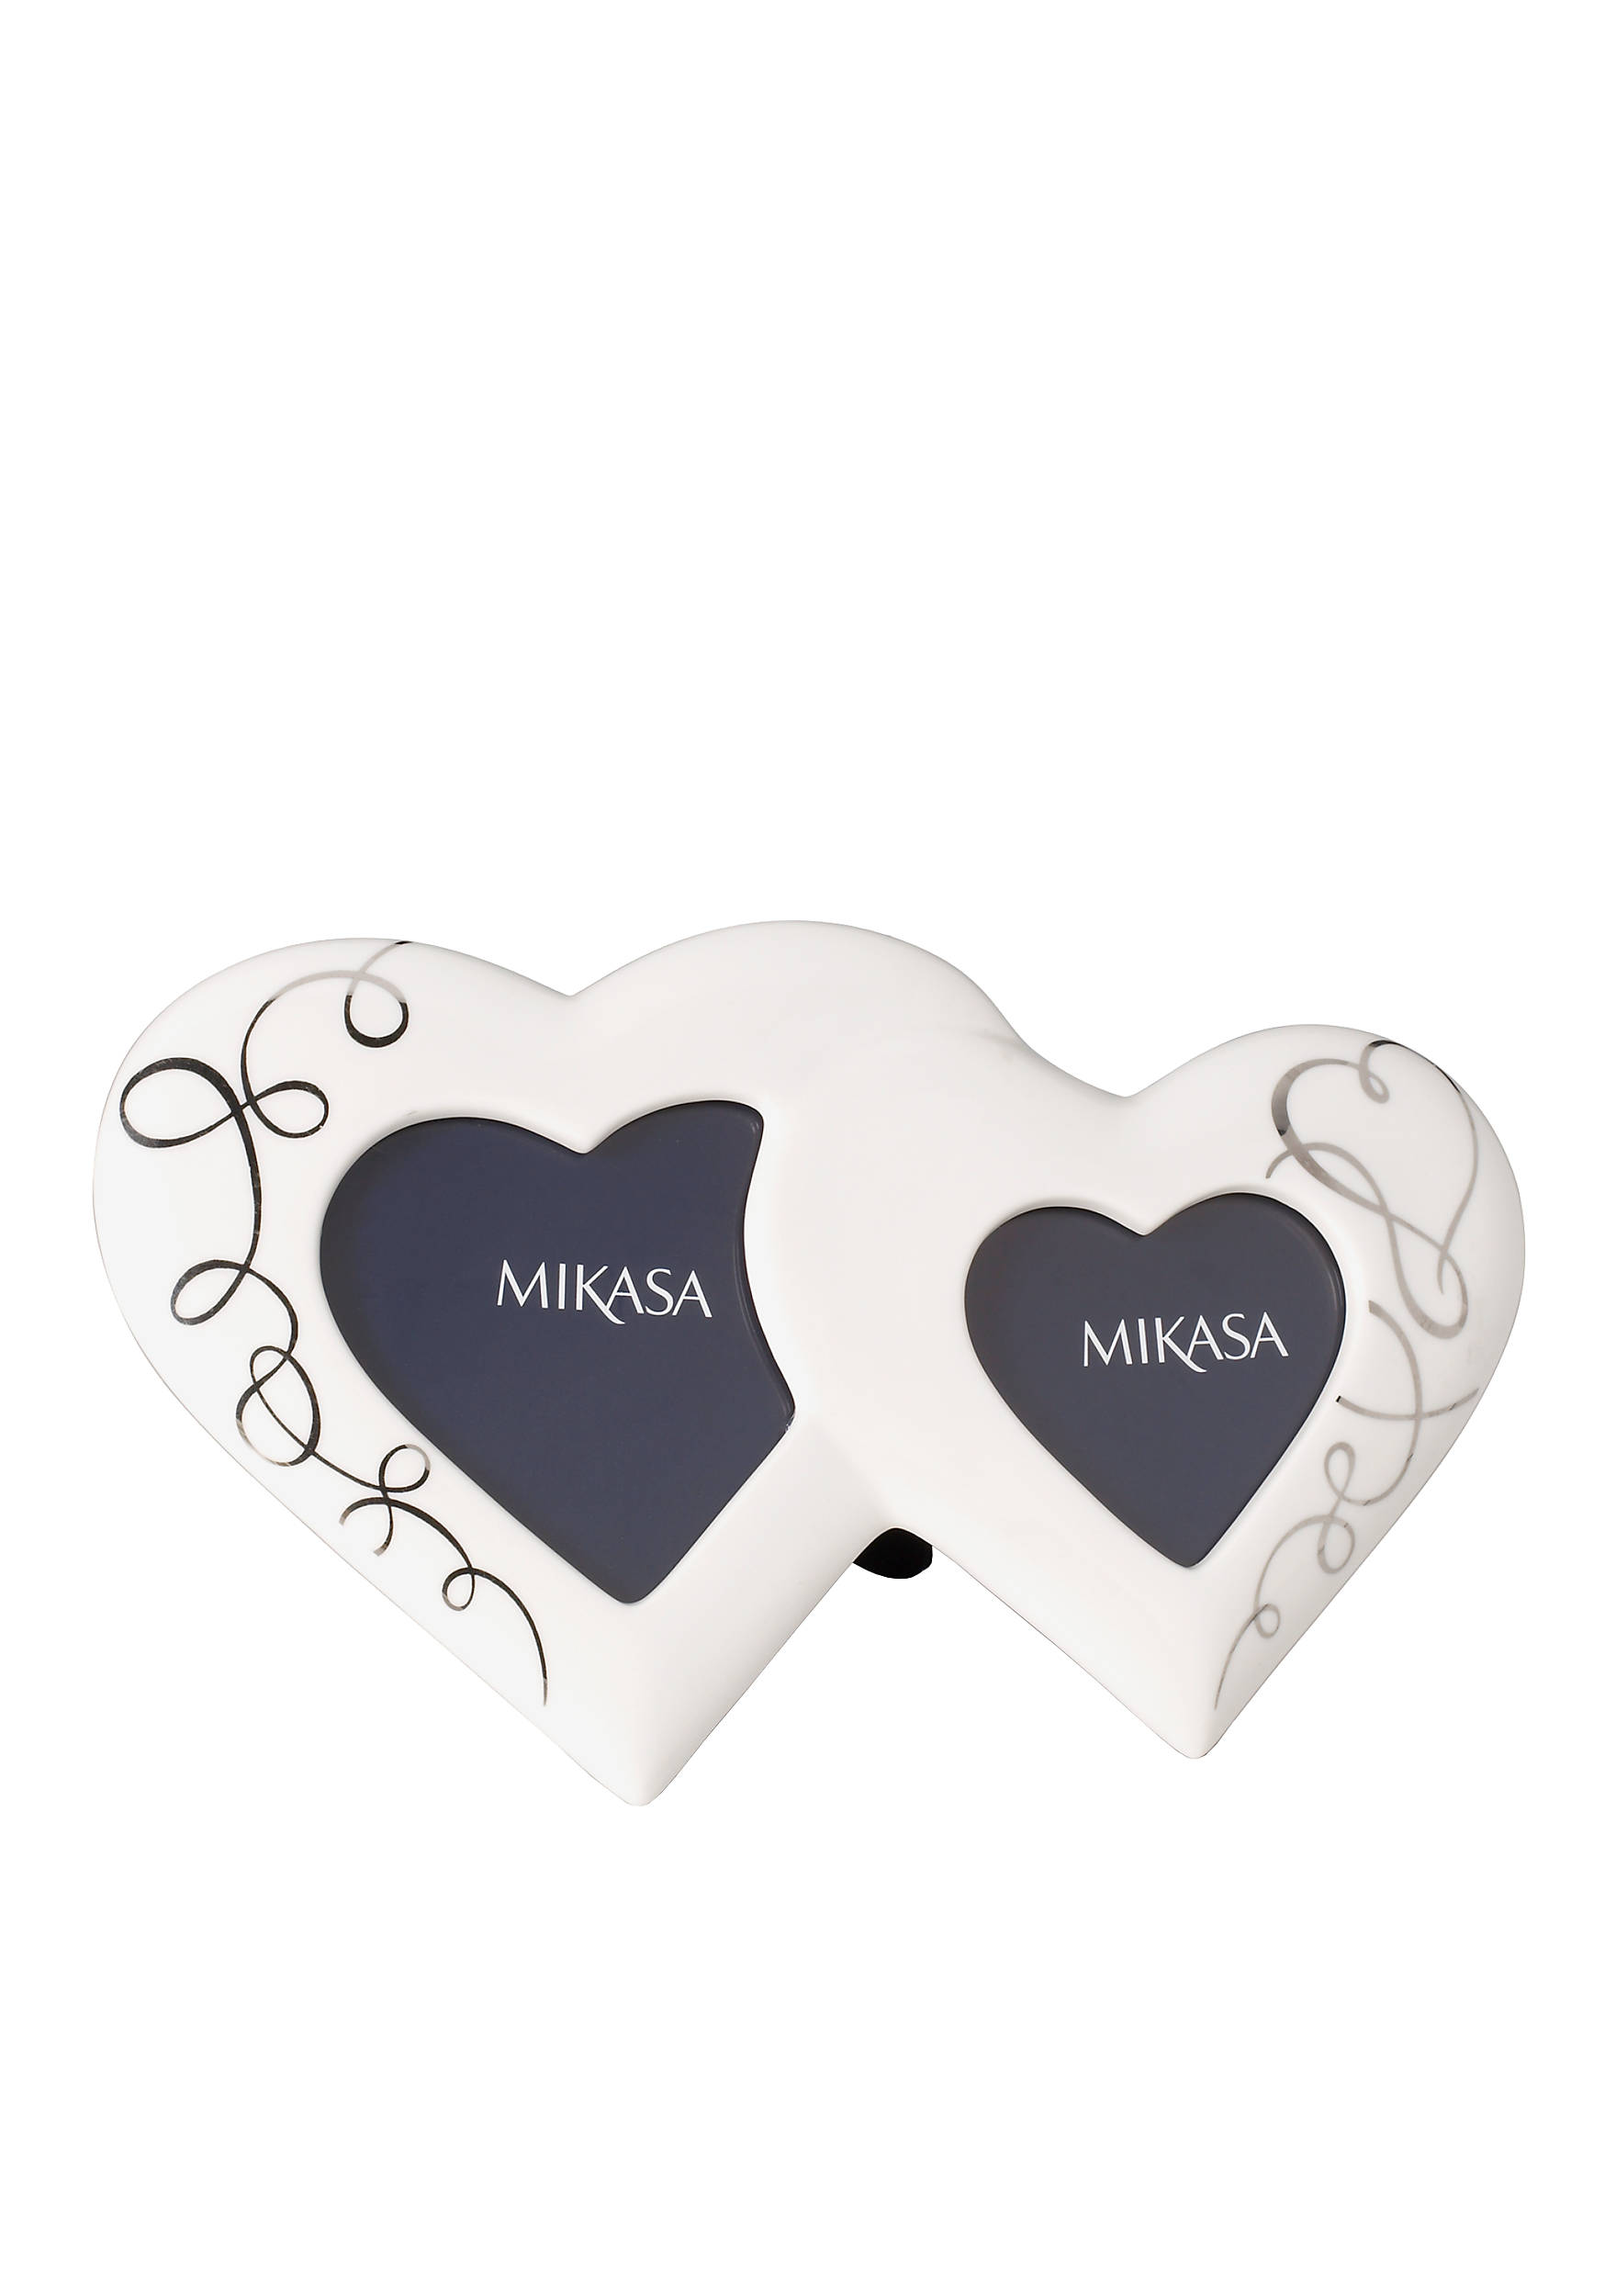 mikasa love story double heart frame belk mikasa love story double heart frame 76000305065570 images jeuxipadfo - Mikasa Picture Frames